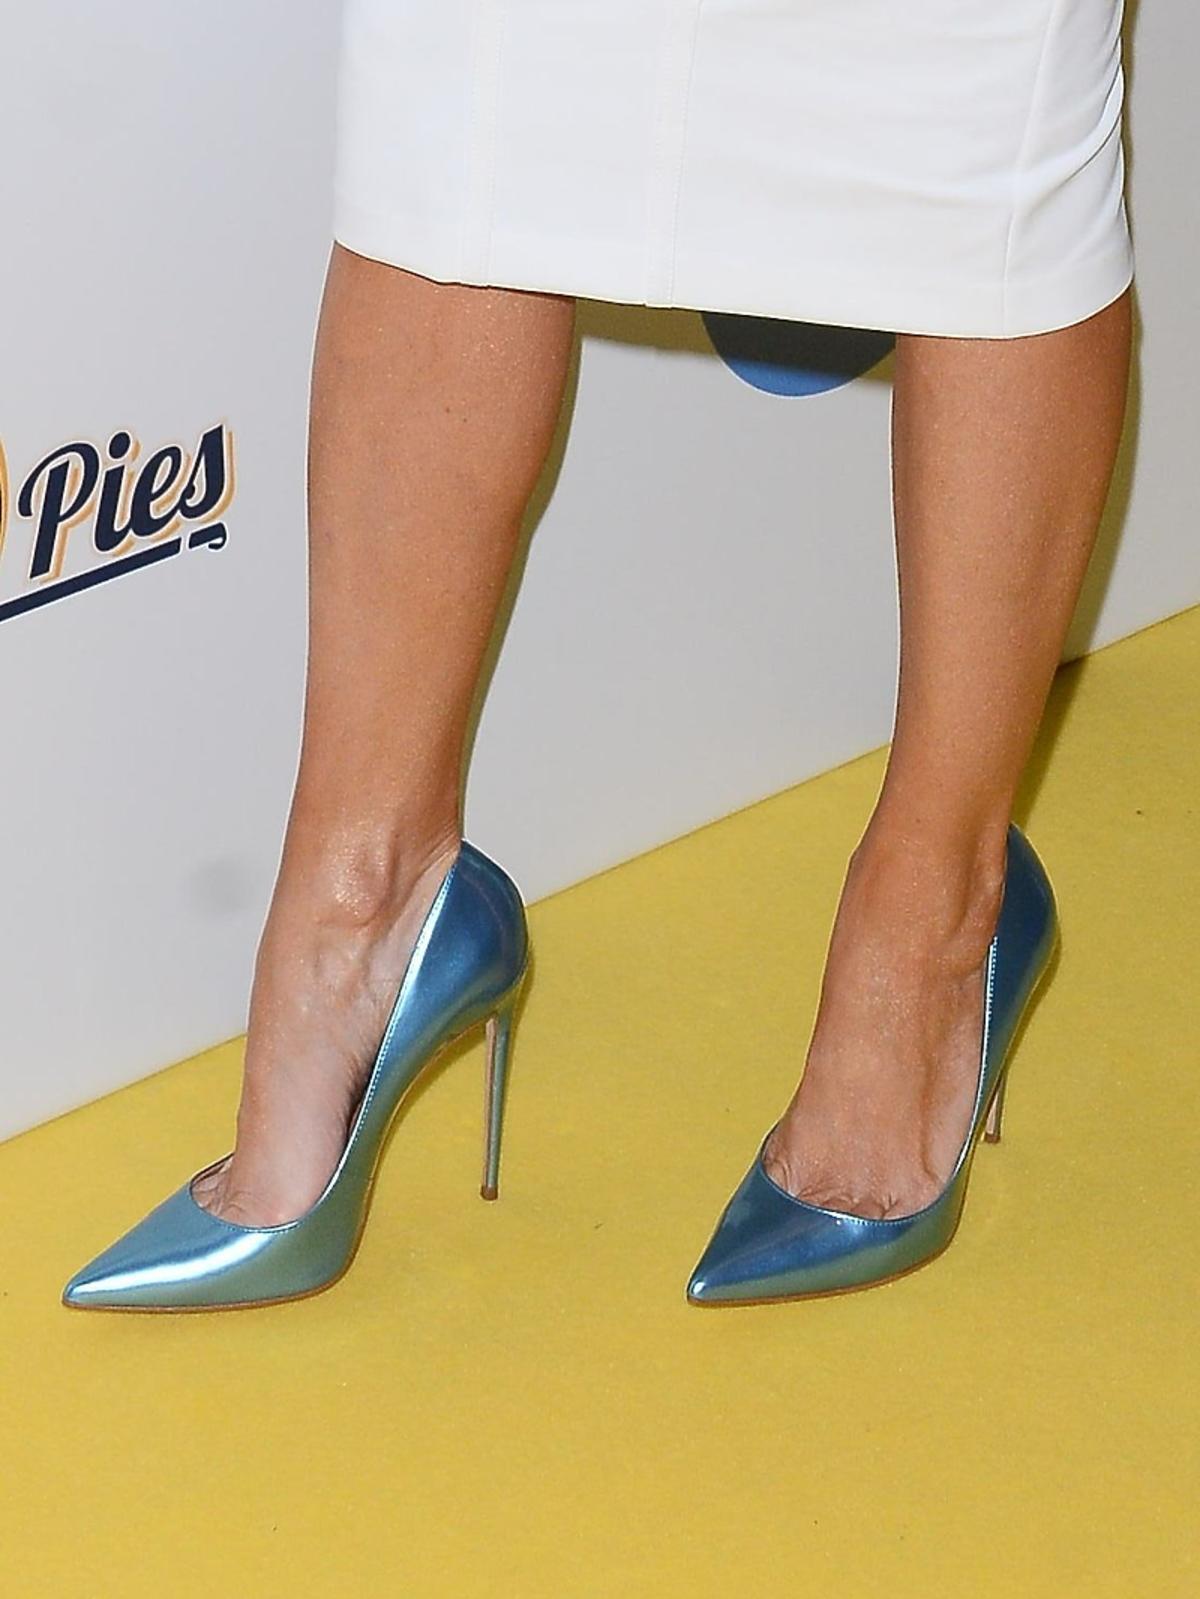 Joanna Krupa promuje program